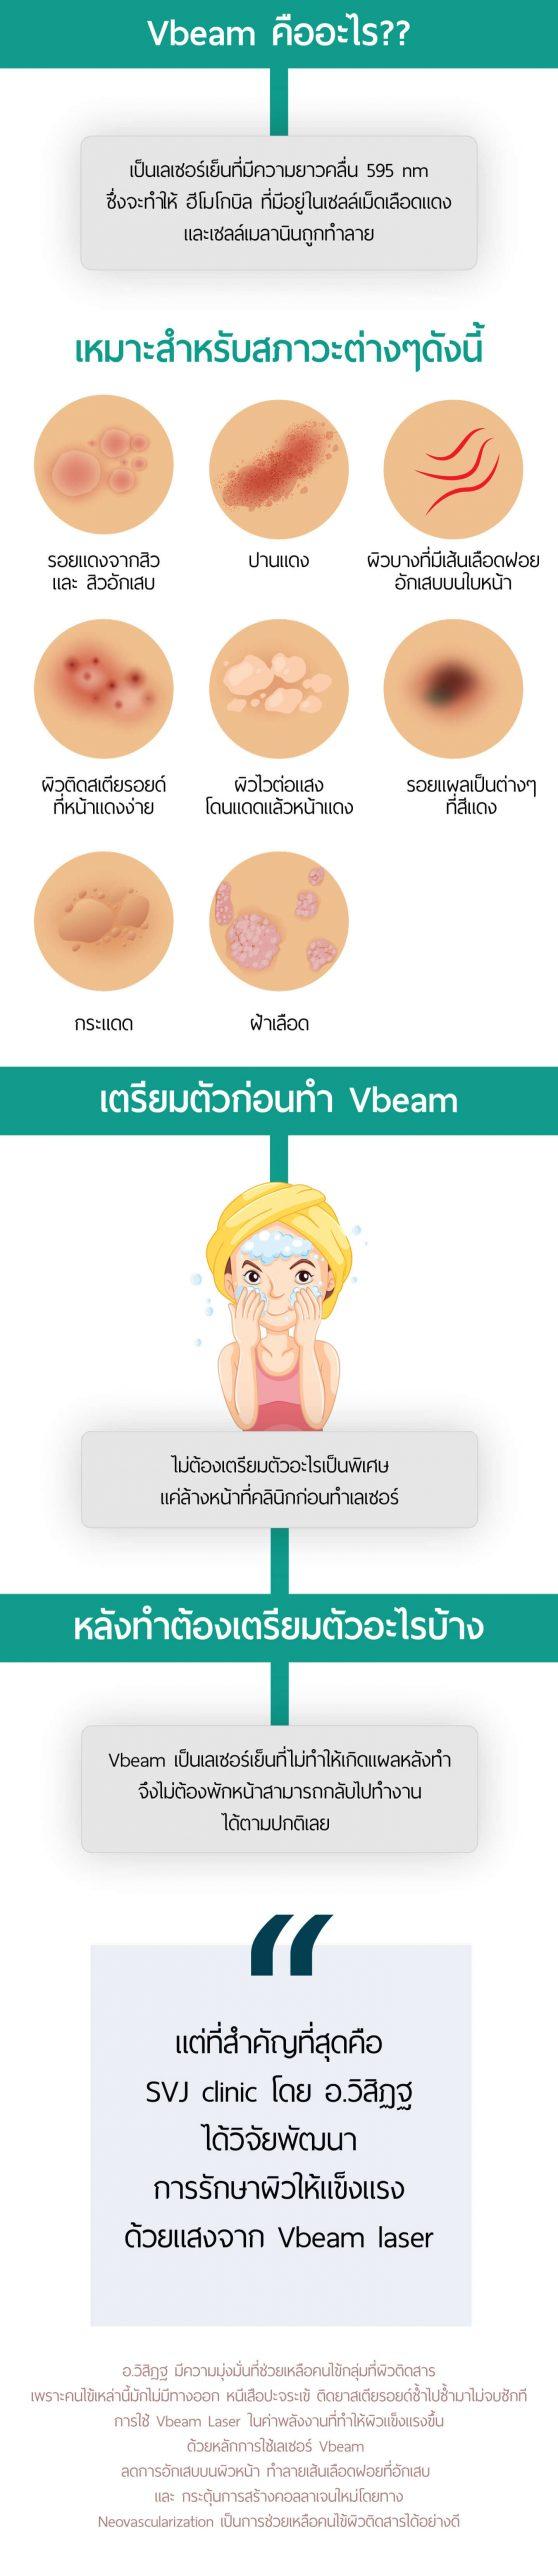 Vbeam คืออะไร